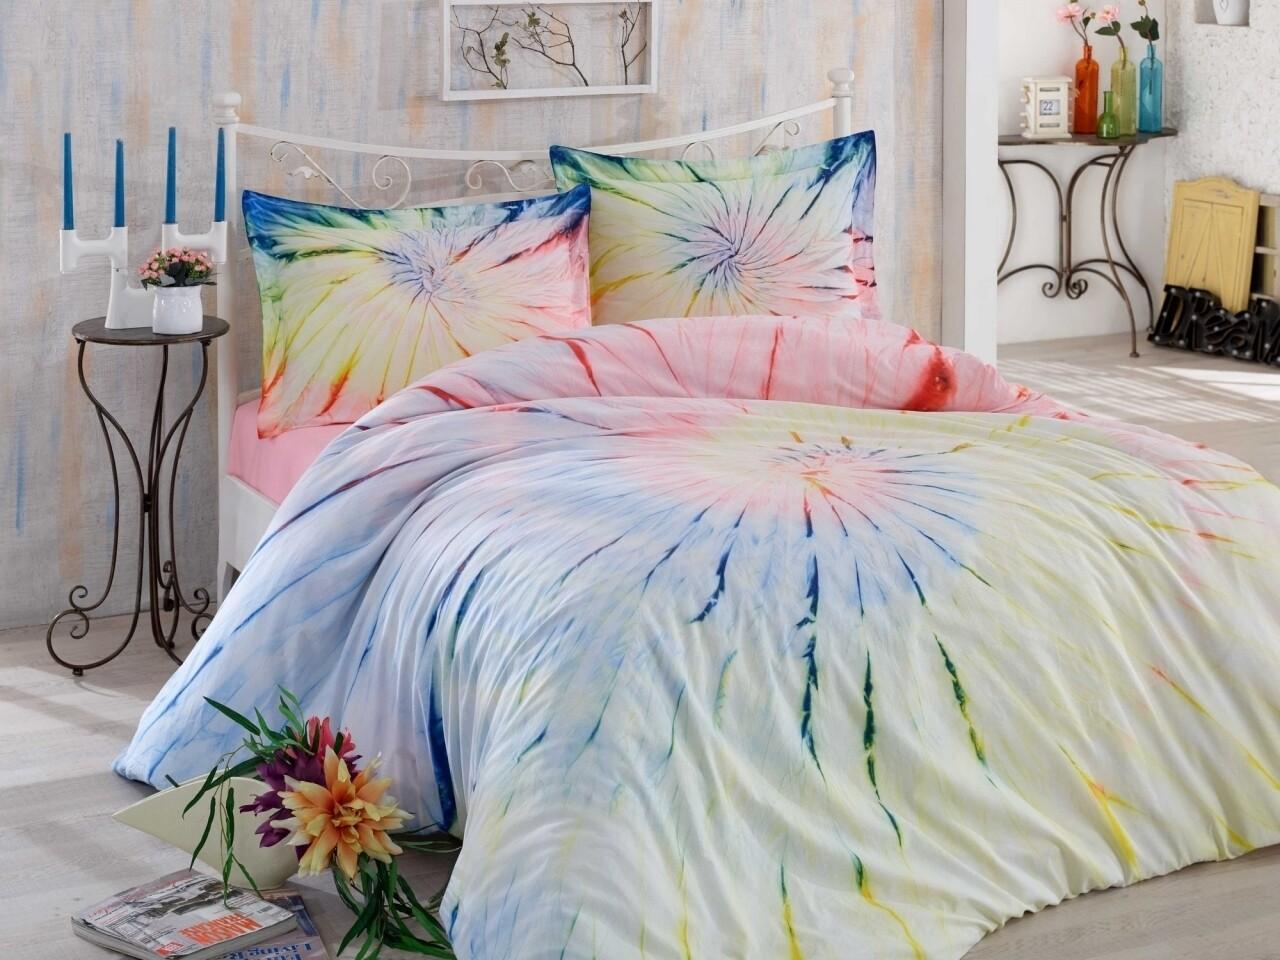 Lenjerie de pat pentru o persoana, 3 piese, 100% bumbac poplin, Hobby, Helezon Pink, multicolora